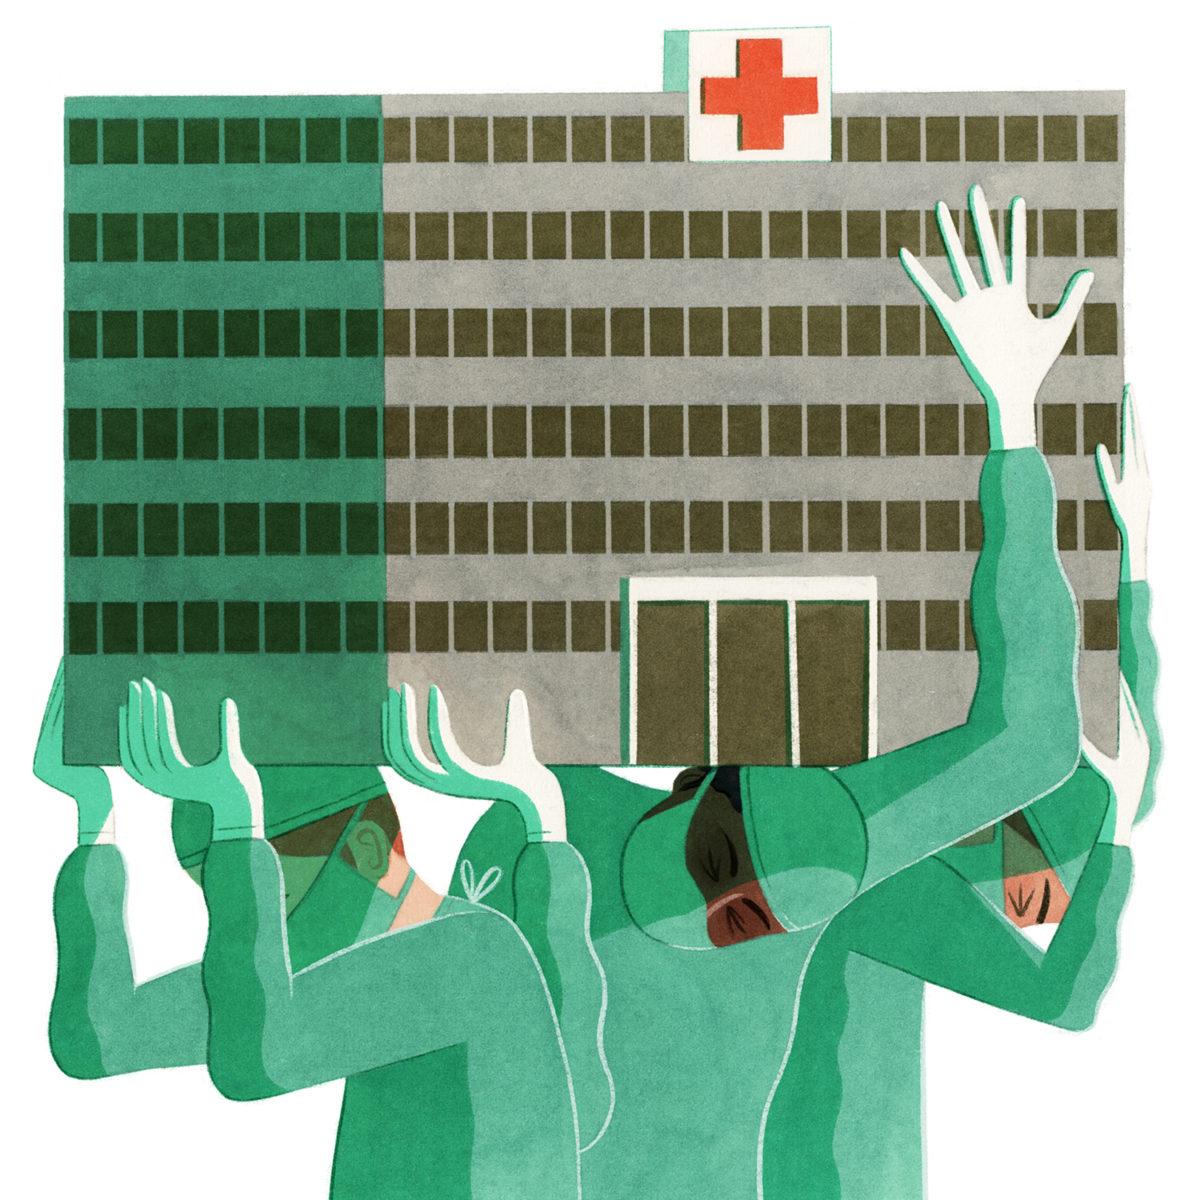 Richard Solomon - NYT Hospital Final